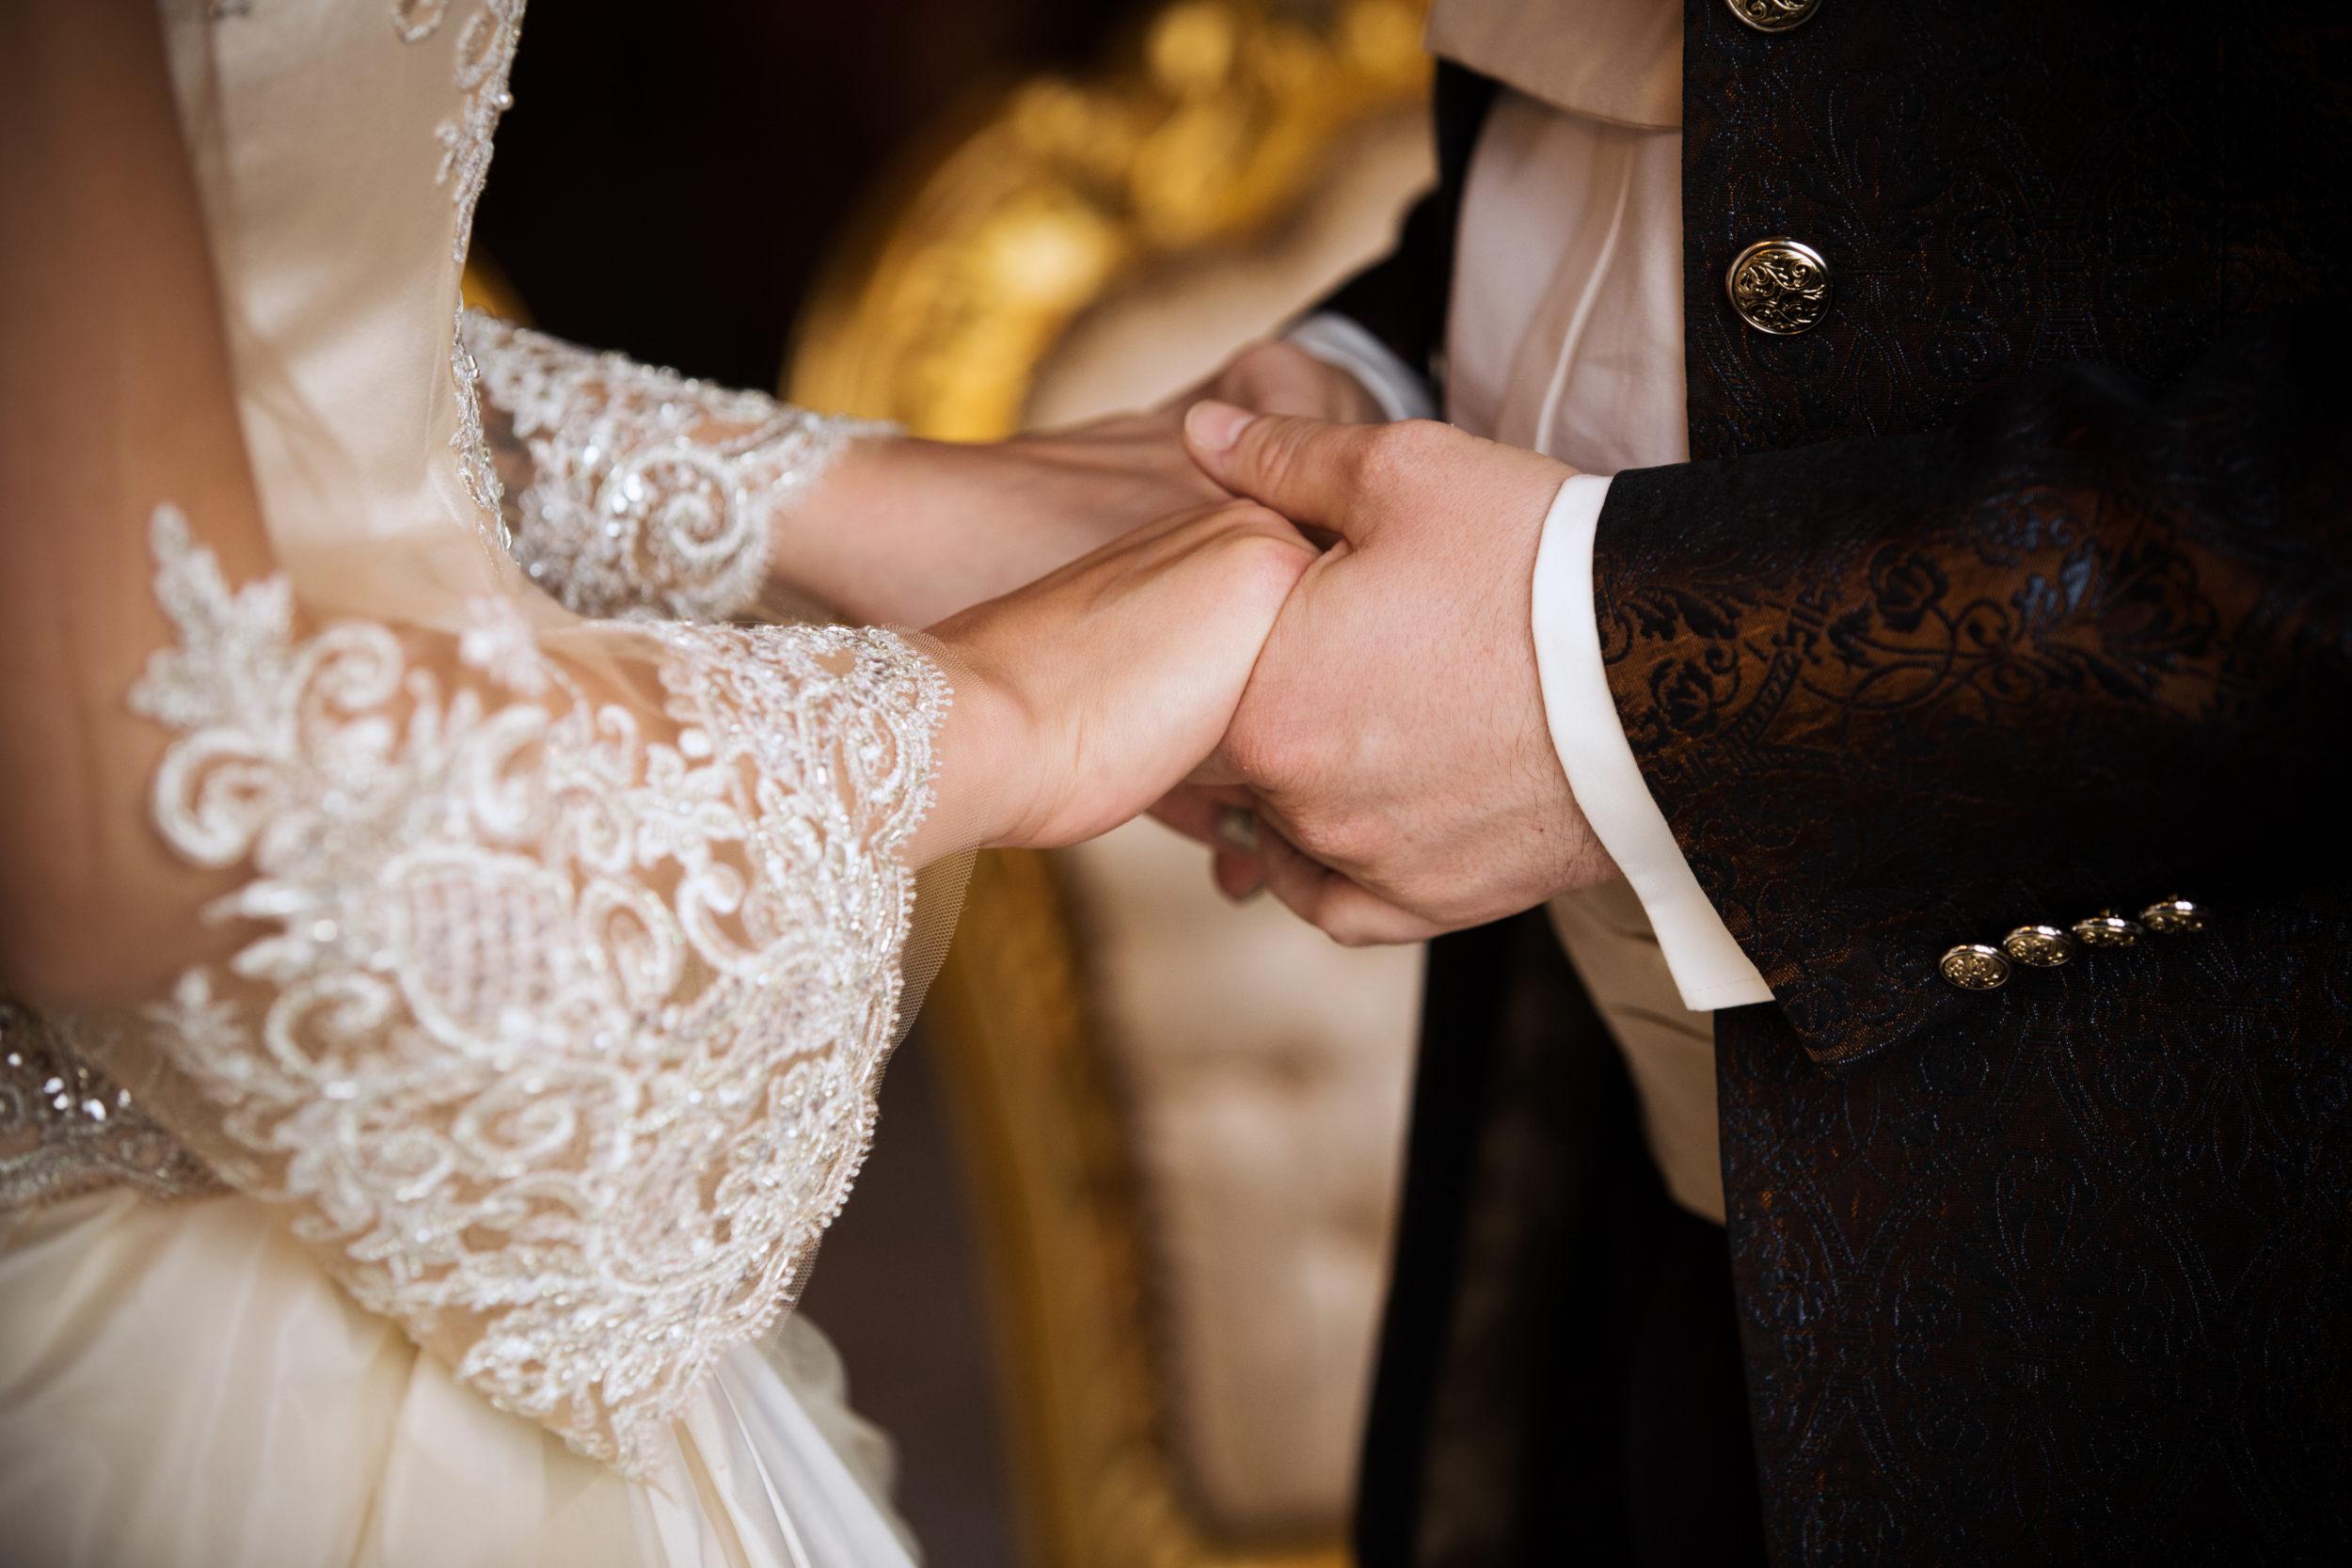 Myrelle Couture Marina Deynega Brautmode Hochzeit Anzug Massgeschneidert Royal Wedding Cm 061